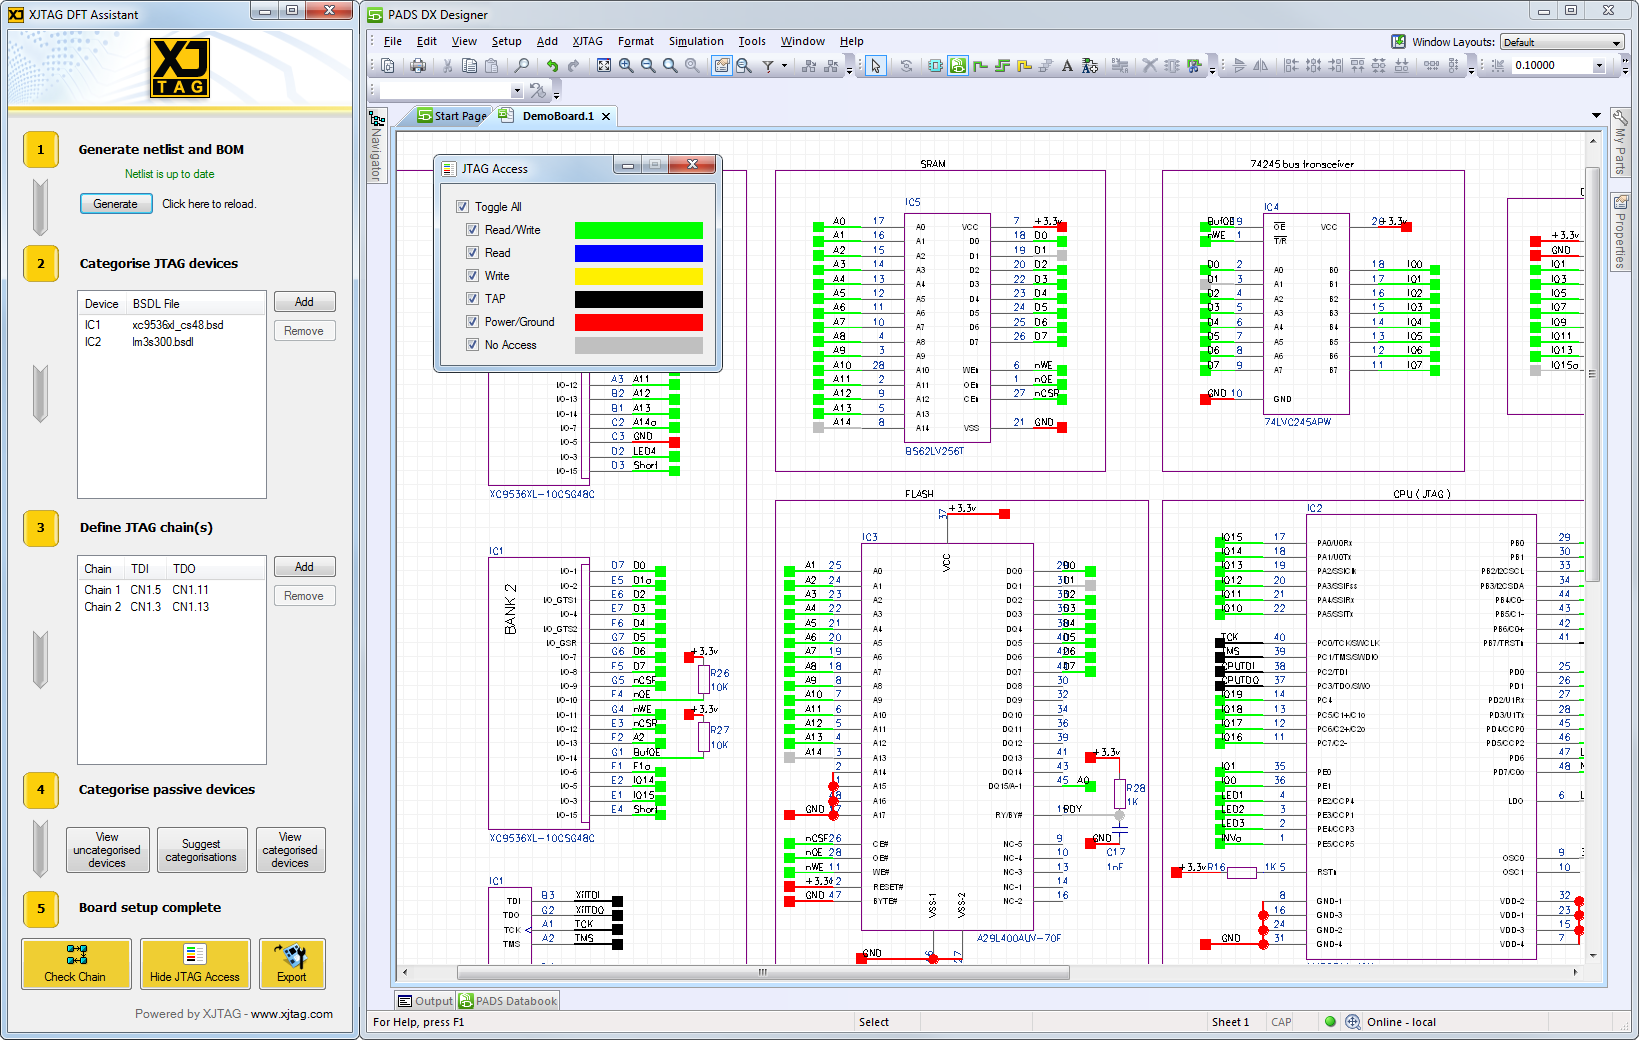 XJTAG DFT Assistant für Mentor Graphics PADS, Kostenloses JTAG Plugin